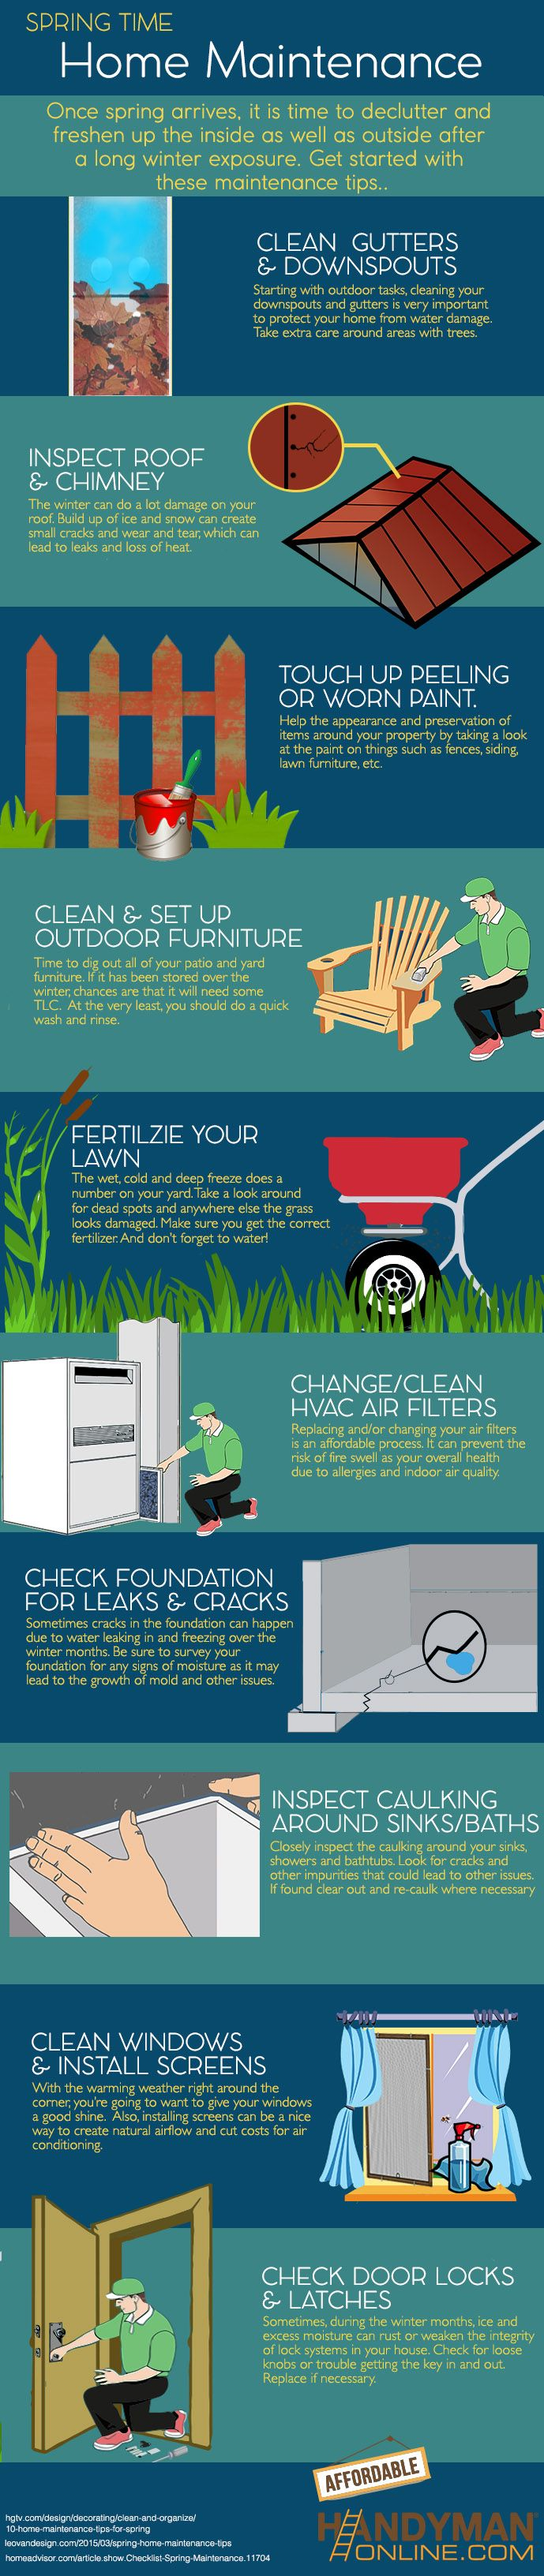 spring home maintenance checklist | home sweet organized home